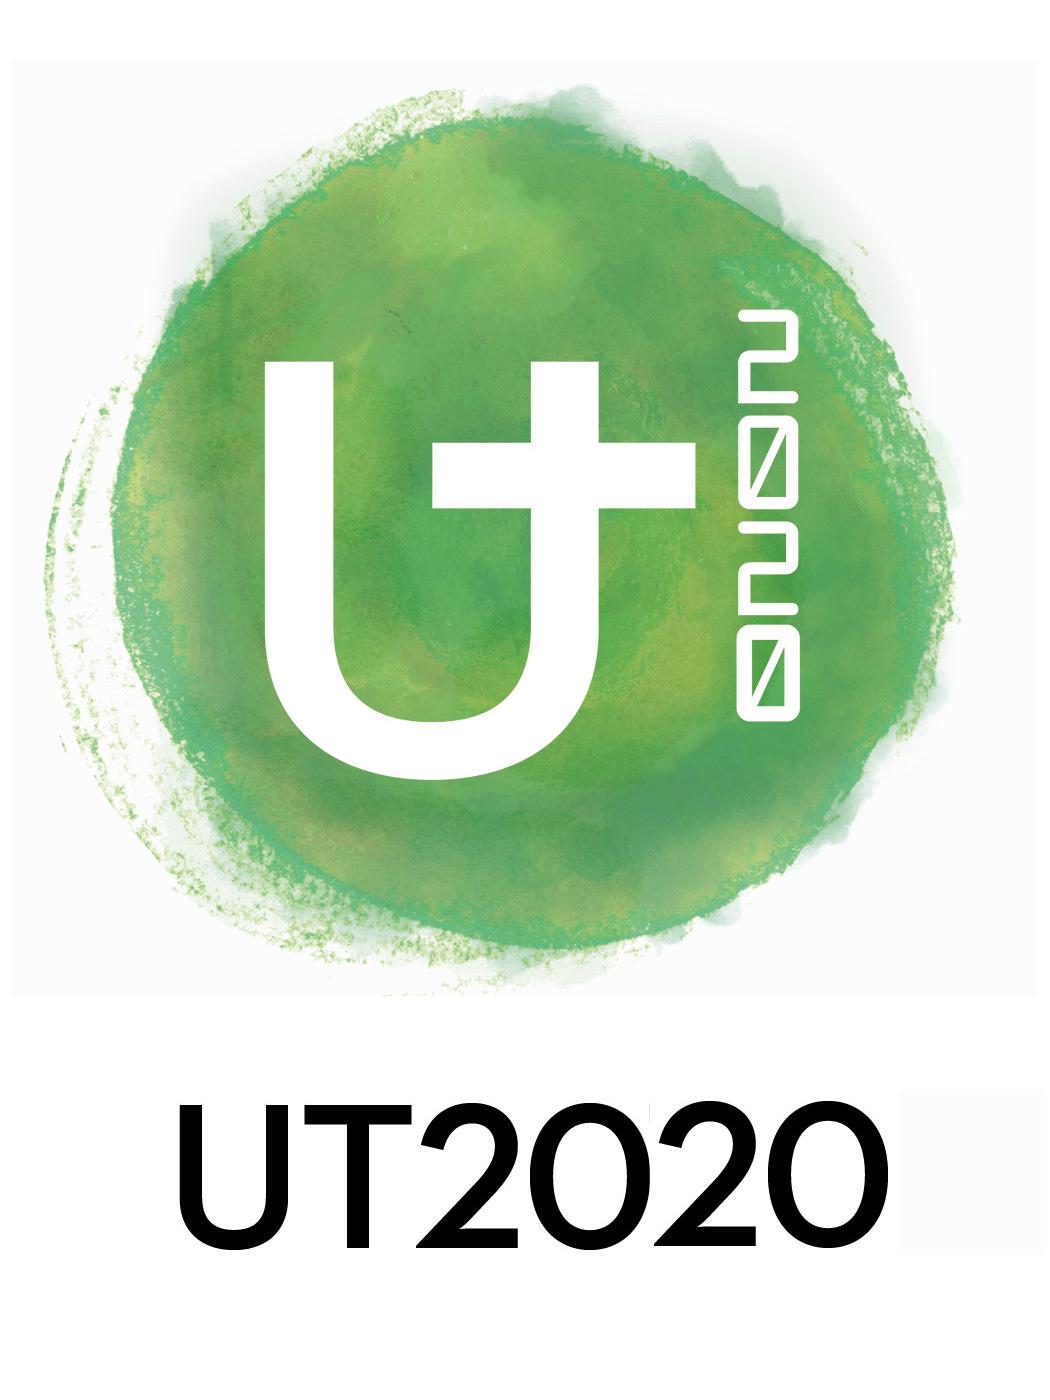 Uusi testamentti 2020